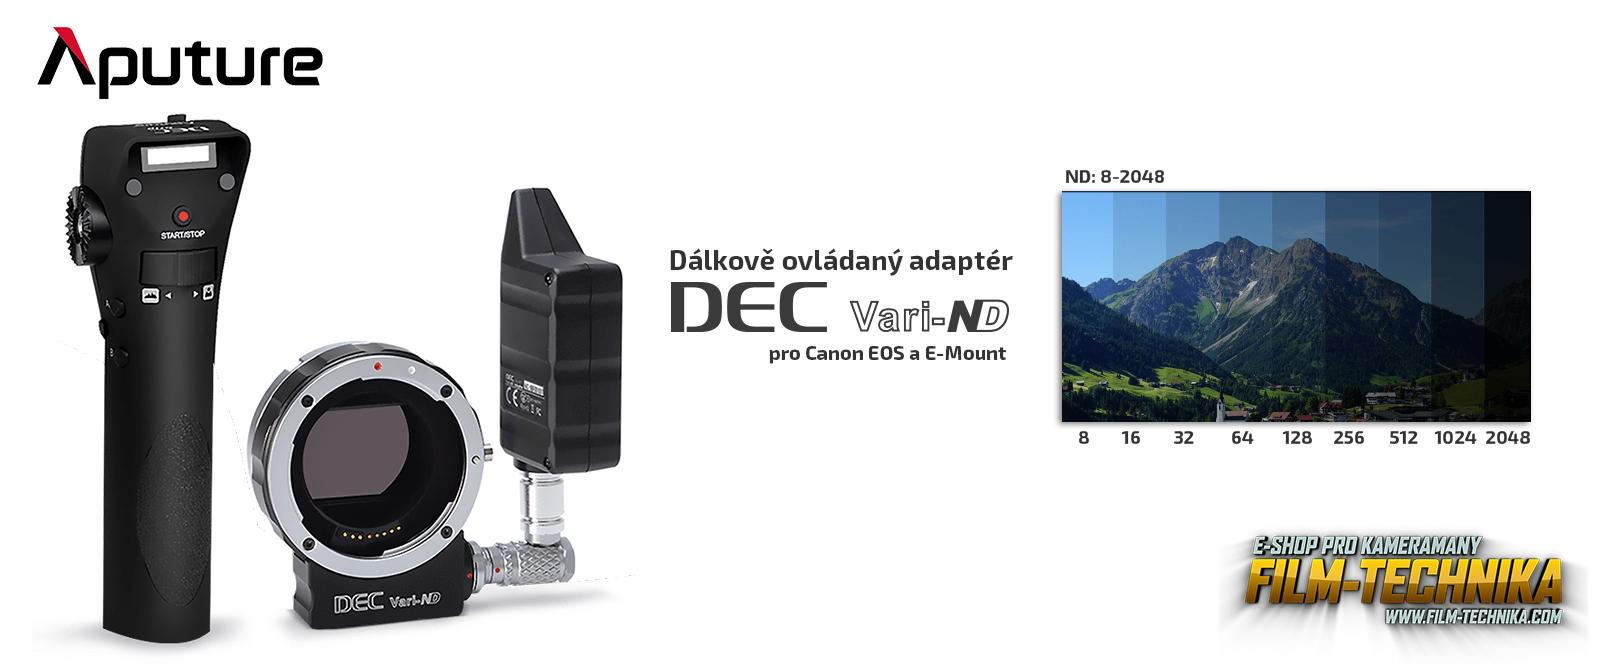 film-technika-aputure-DEC-ND-m43-EOS-03-intext